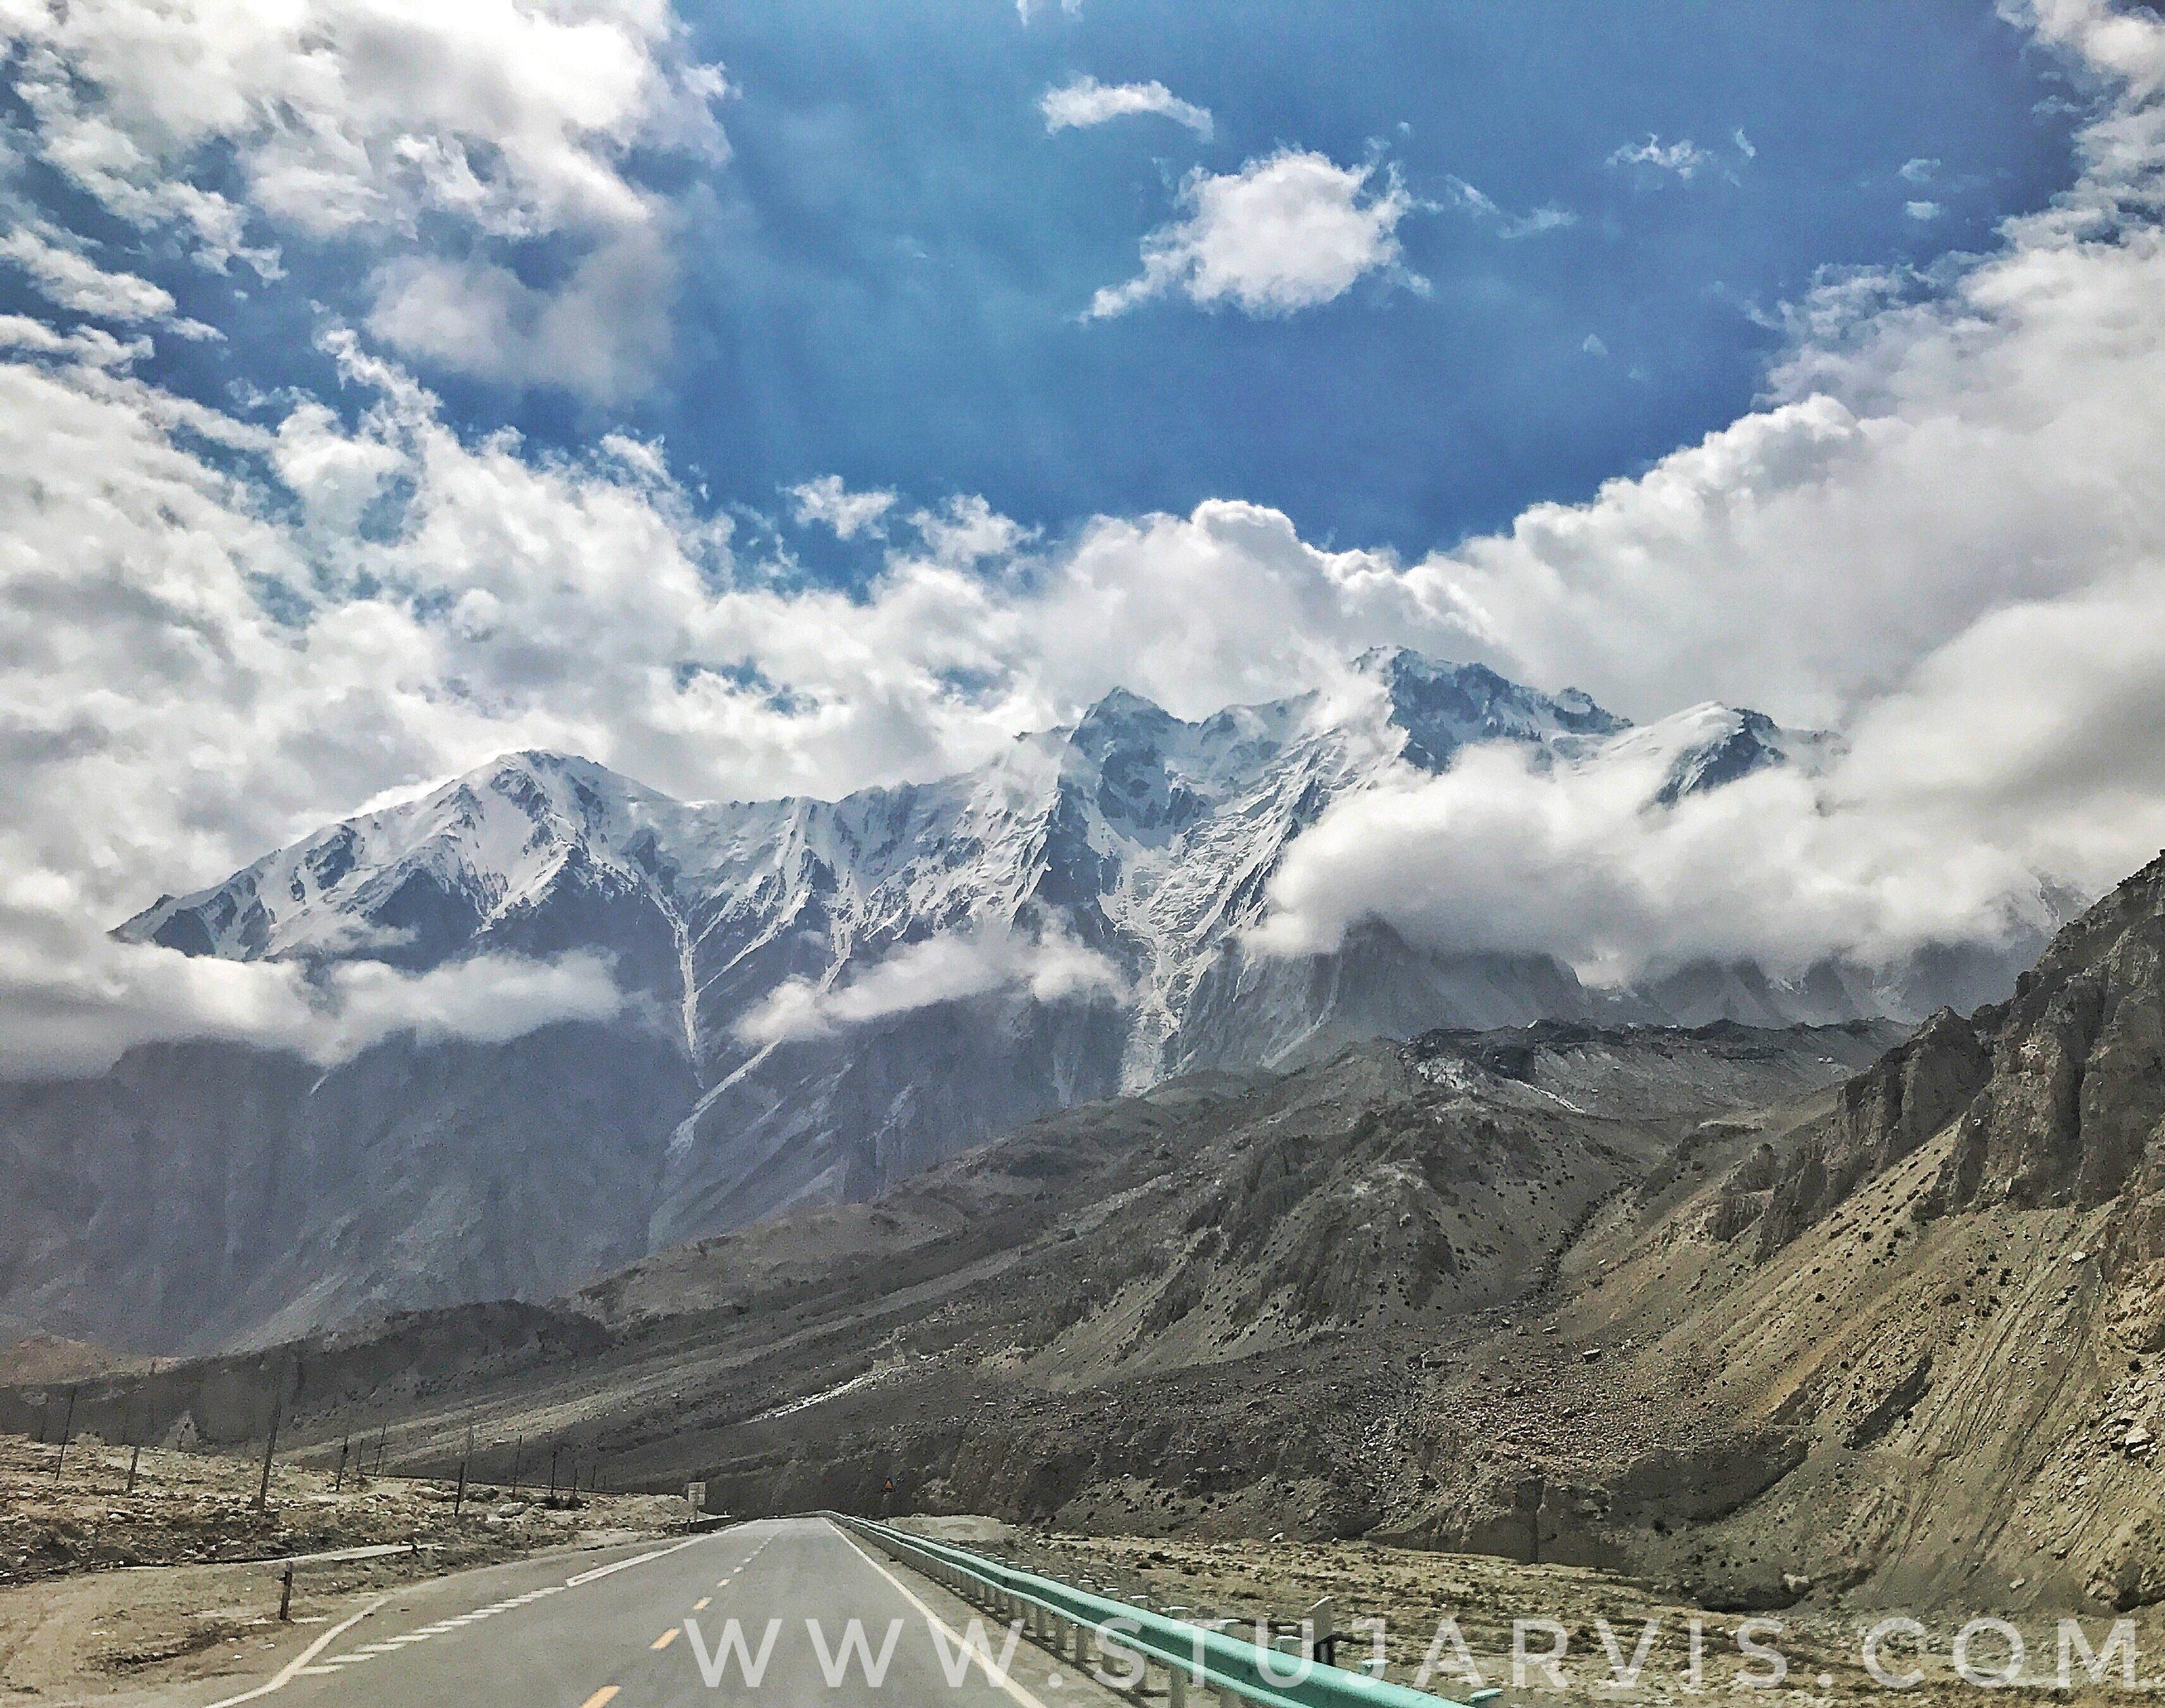 Karakoram Highway, on the Silk Road with www.stujarvis.com